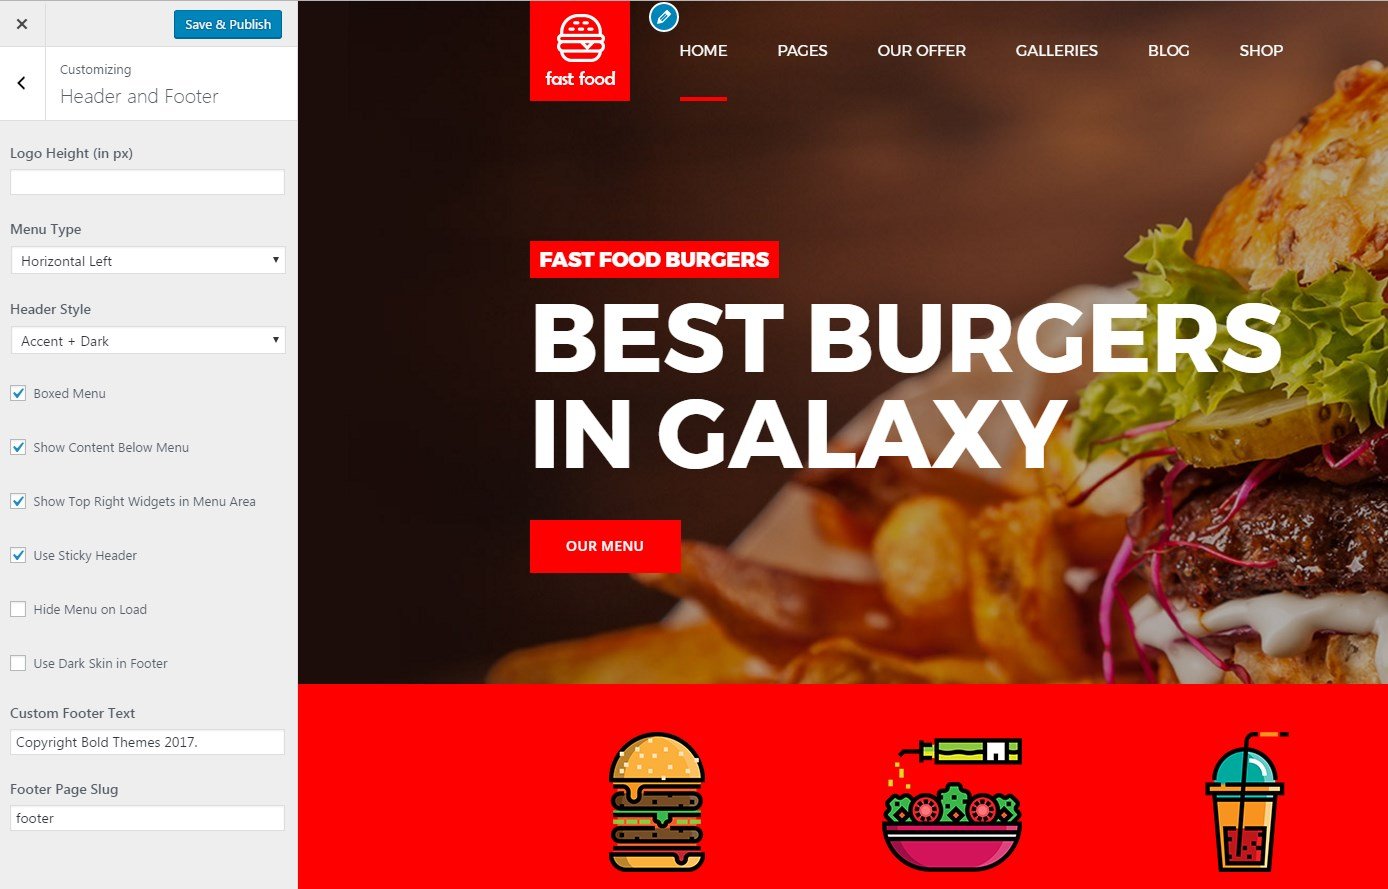 https://documentation.bold-themes.com/fast-food/wp-content/uploads/sites/13/2016/07/20-1.jpg